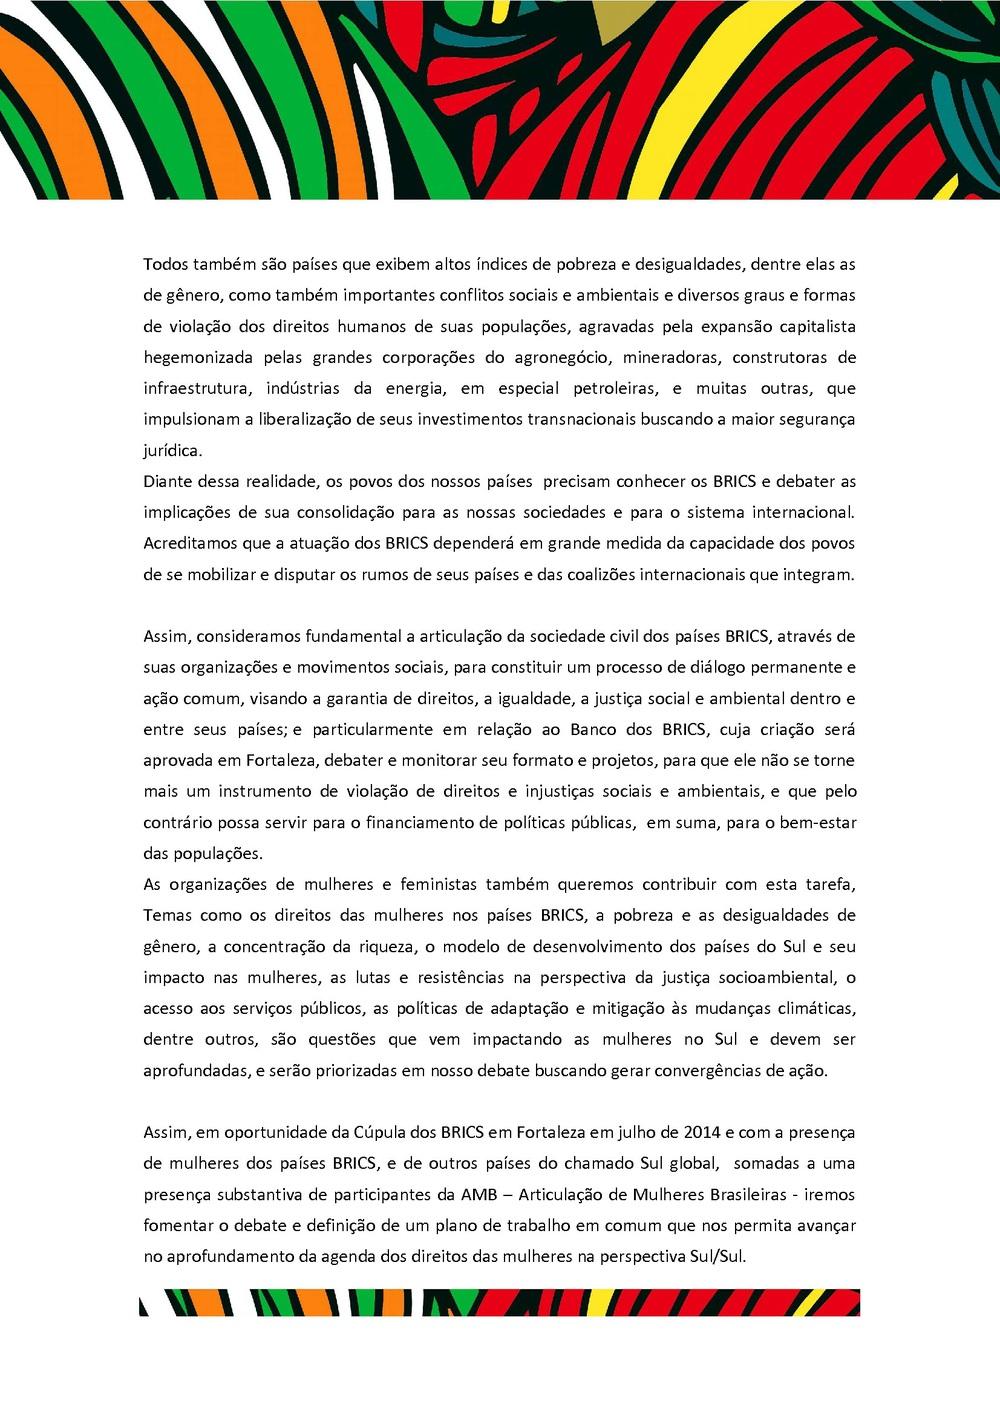 original_BRICS2_agenda_forum_de_mulheres_portugues2-1